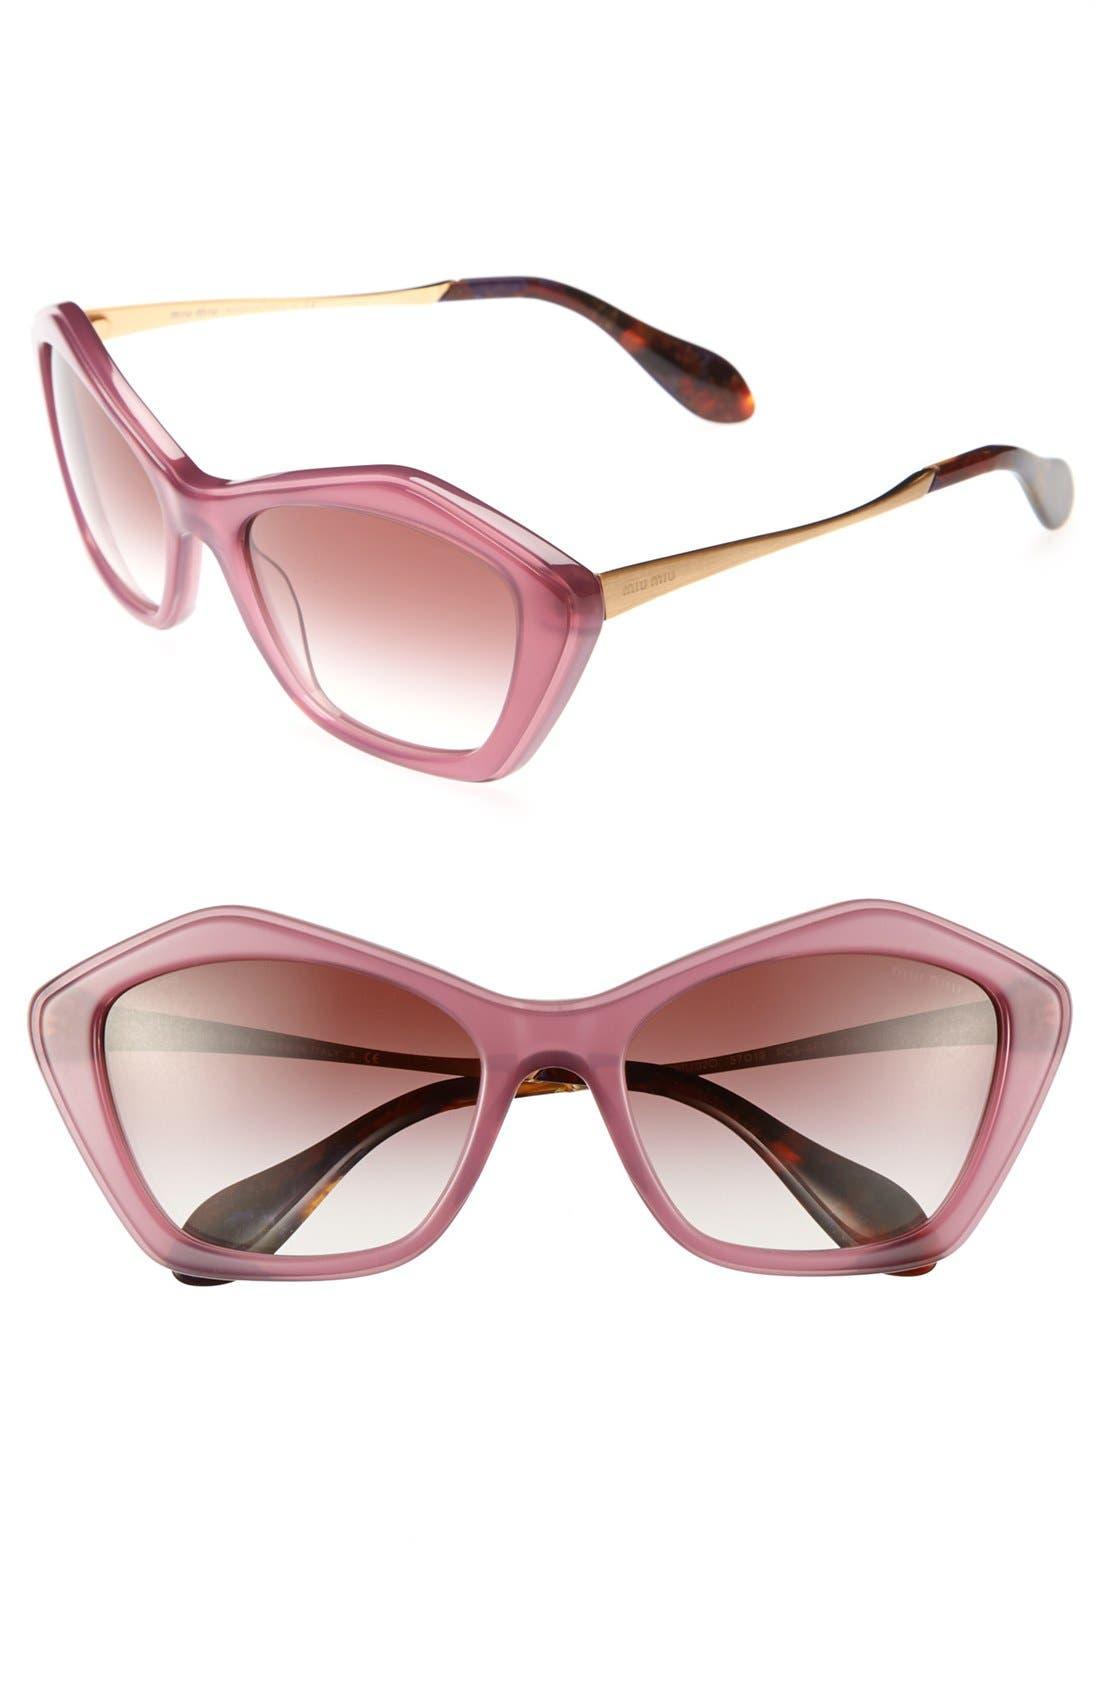 Alternate Image 1 Selected - Miu Miu Angled 57mm Sunglasses